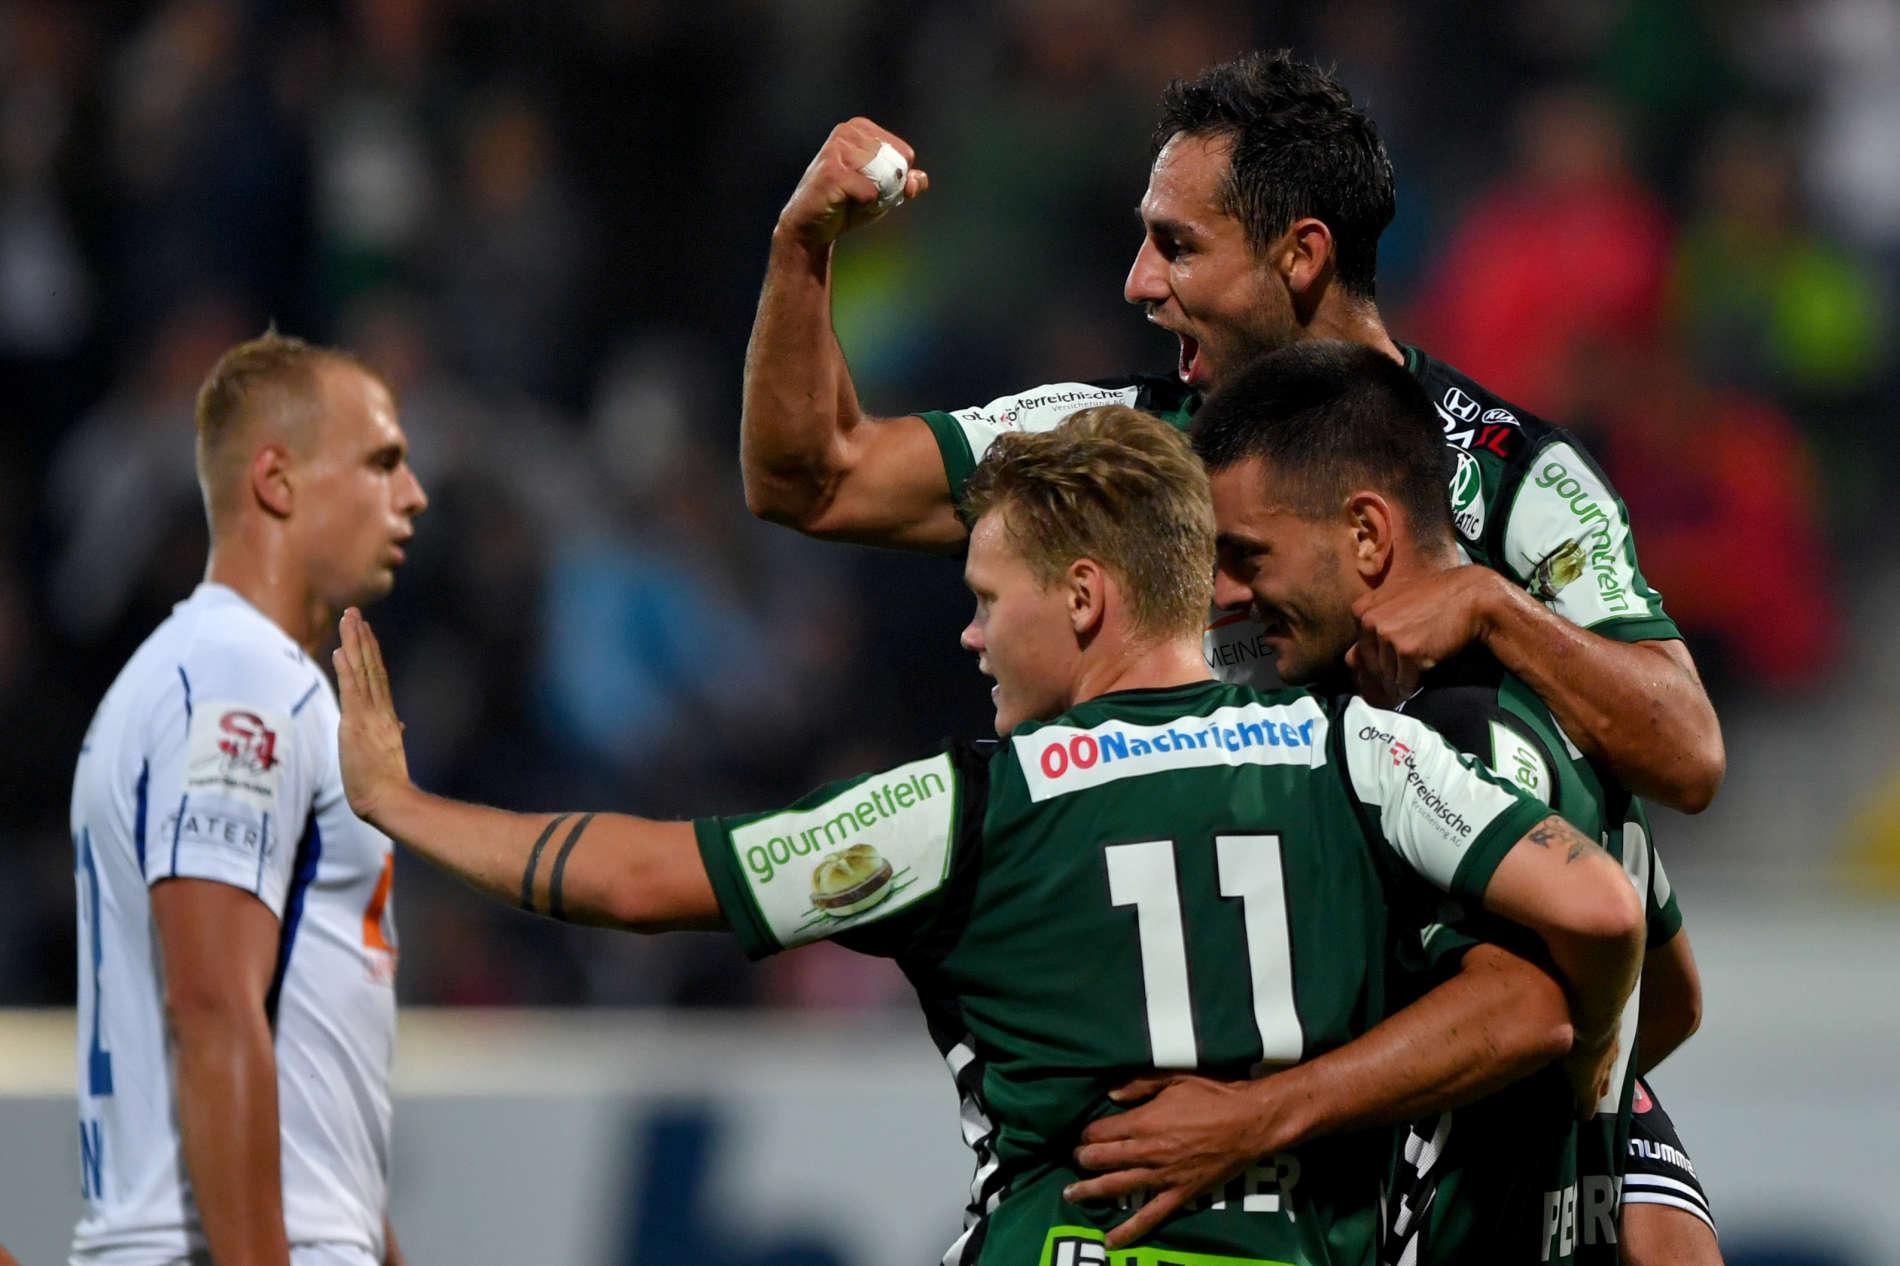 Darijo Pecirep und Thomas Mayer schossen die SV Ried zum 3:0 gegen Horn.